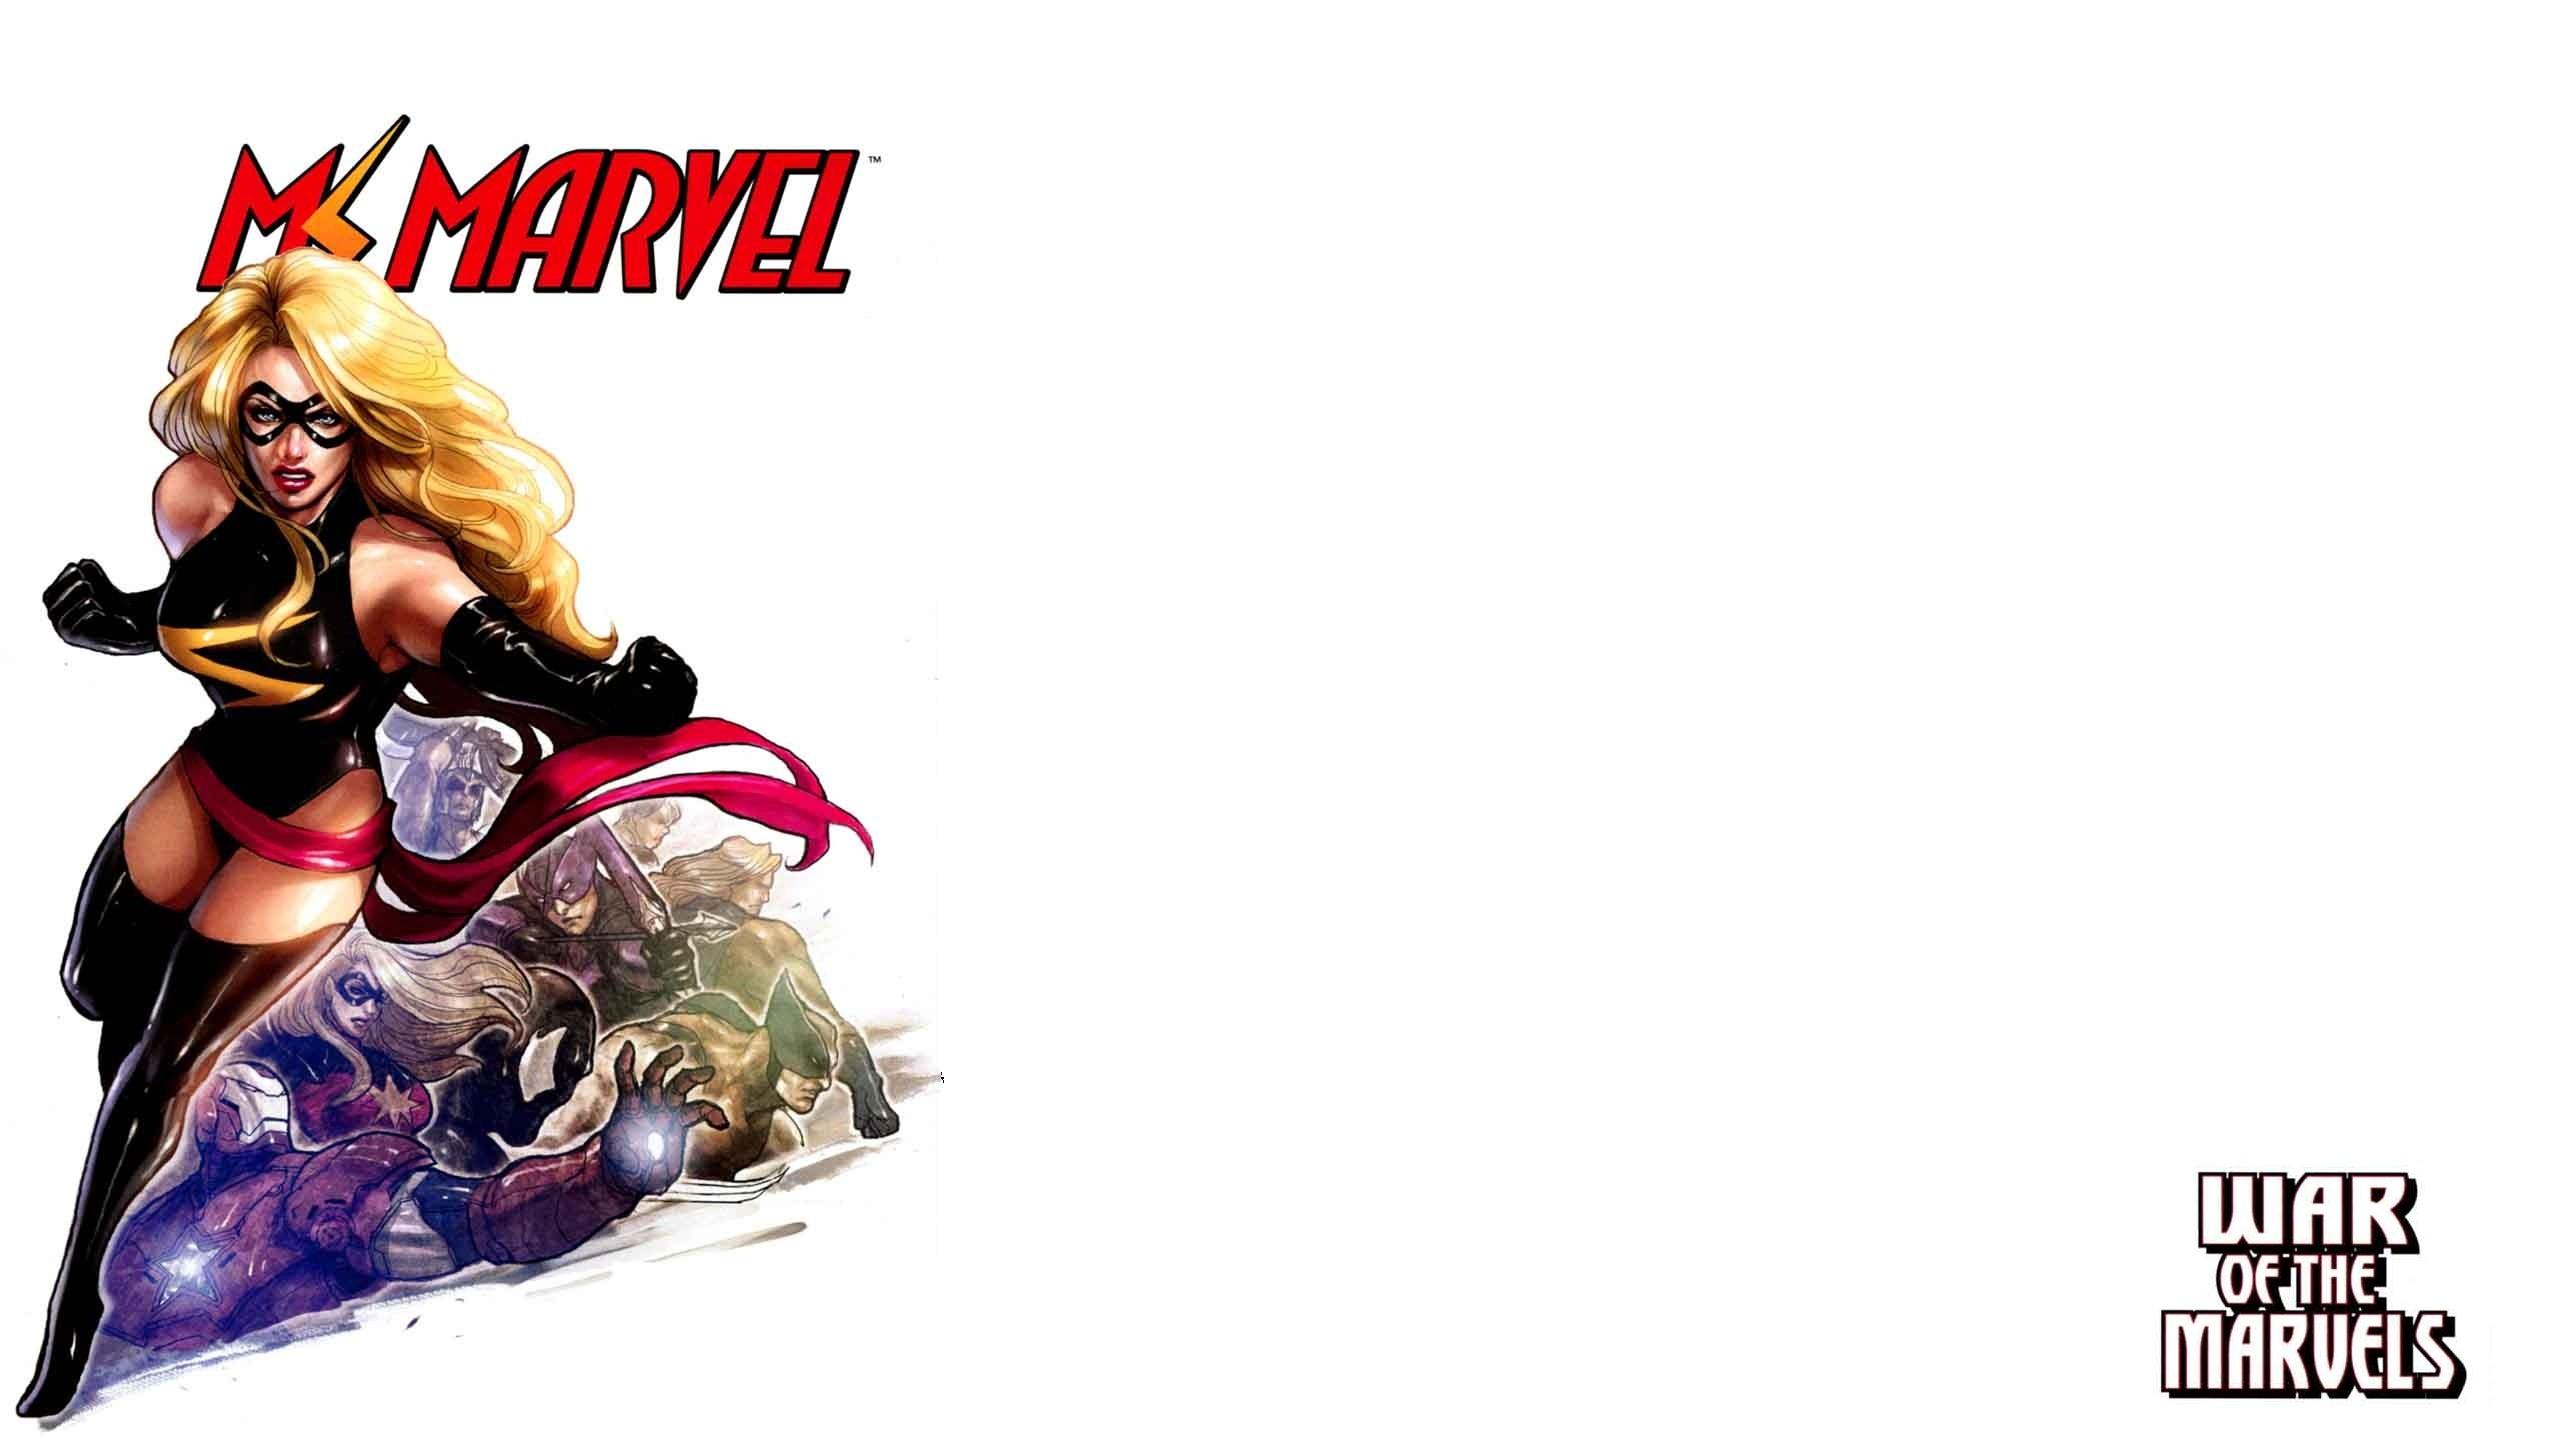 General 2560x1440 Marvel Comics Ms. Marvel superheroines simple background white background blonde